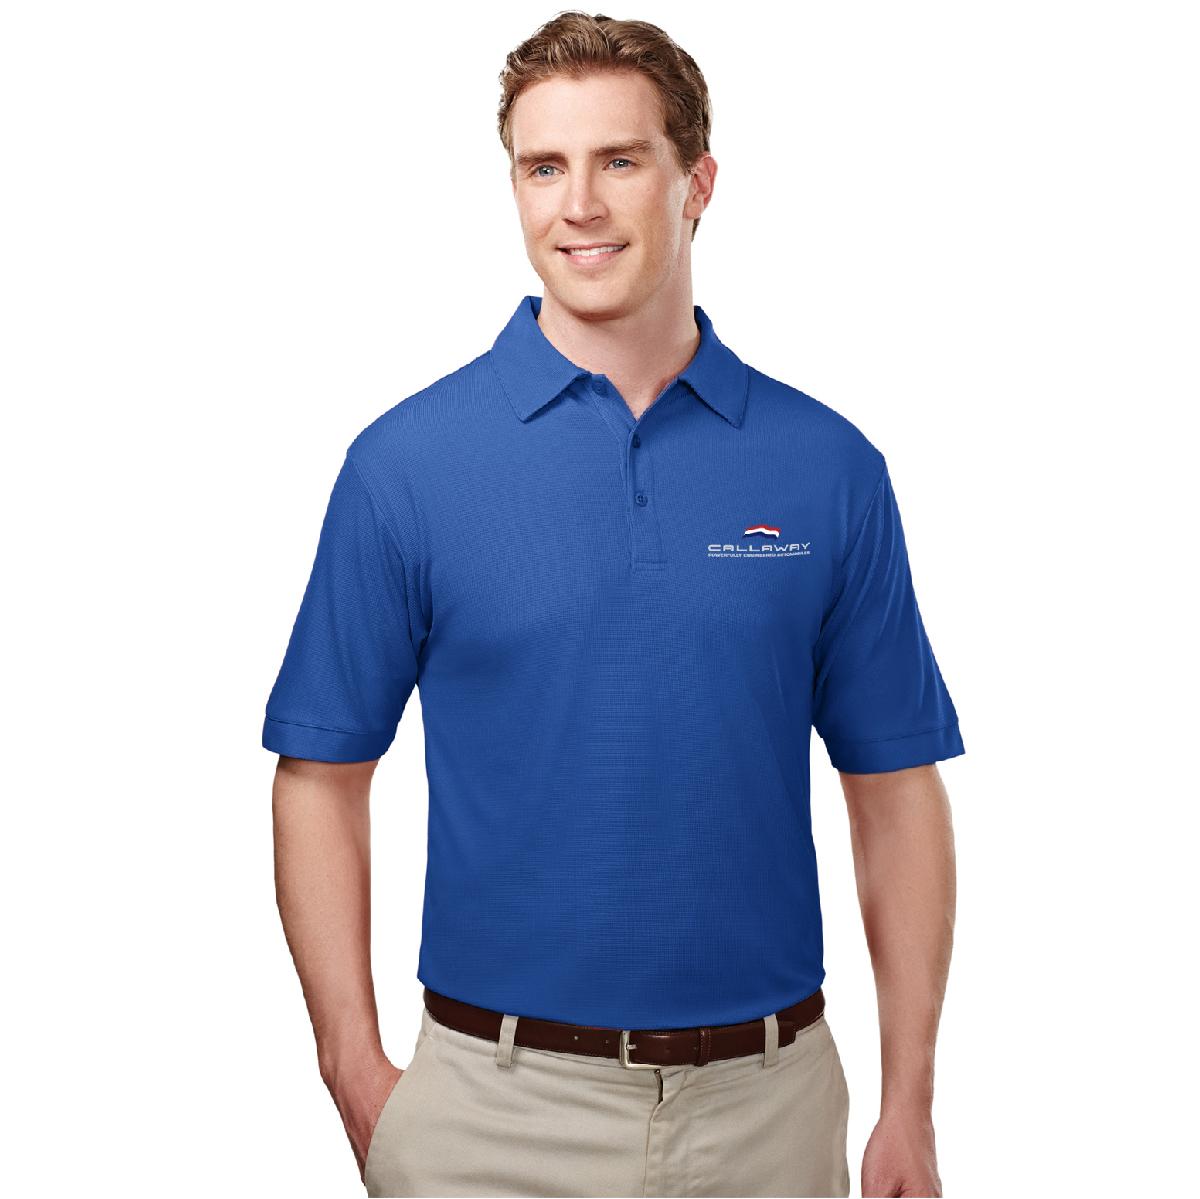 Callaway Cars Polo Shirt, Royal Blue